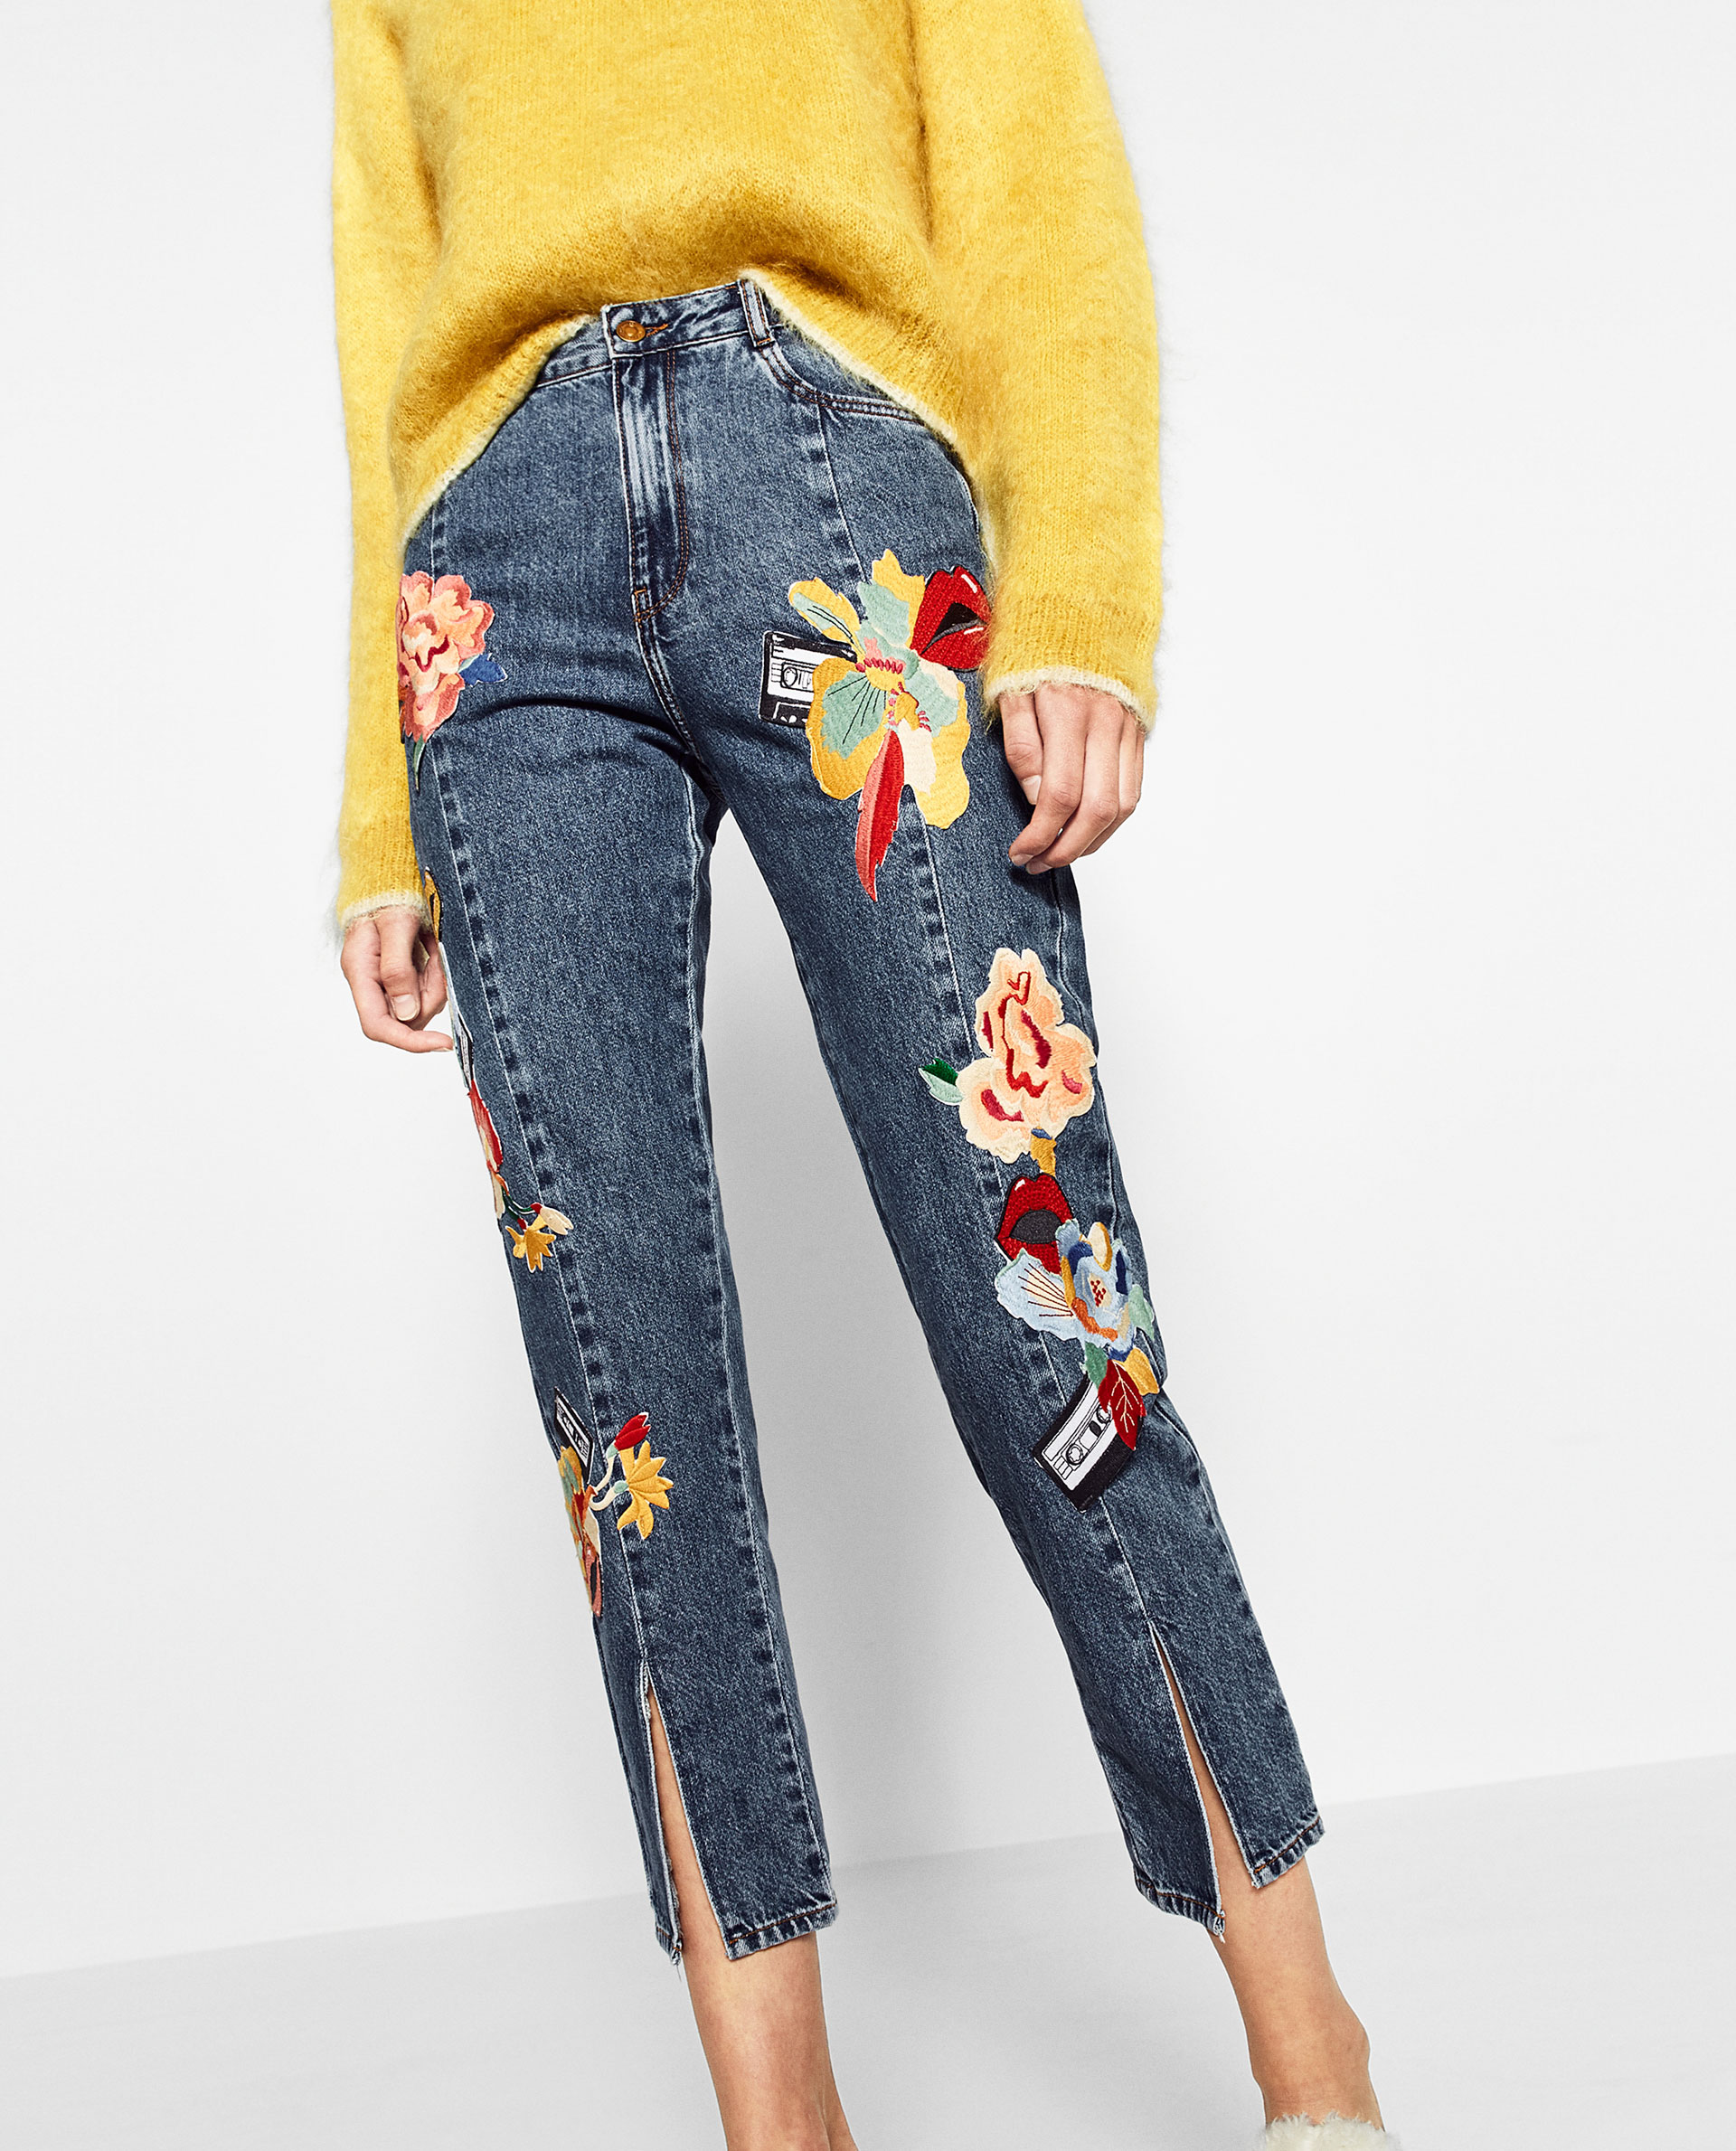 Zara Embroidered jeans.jpg